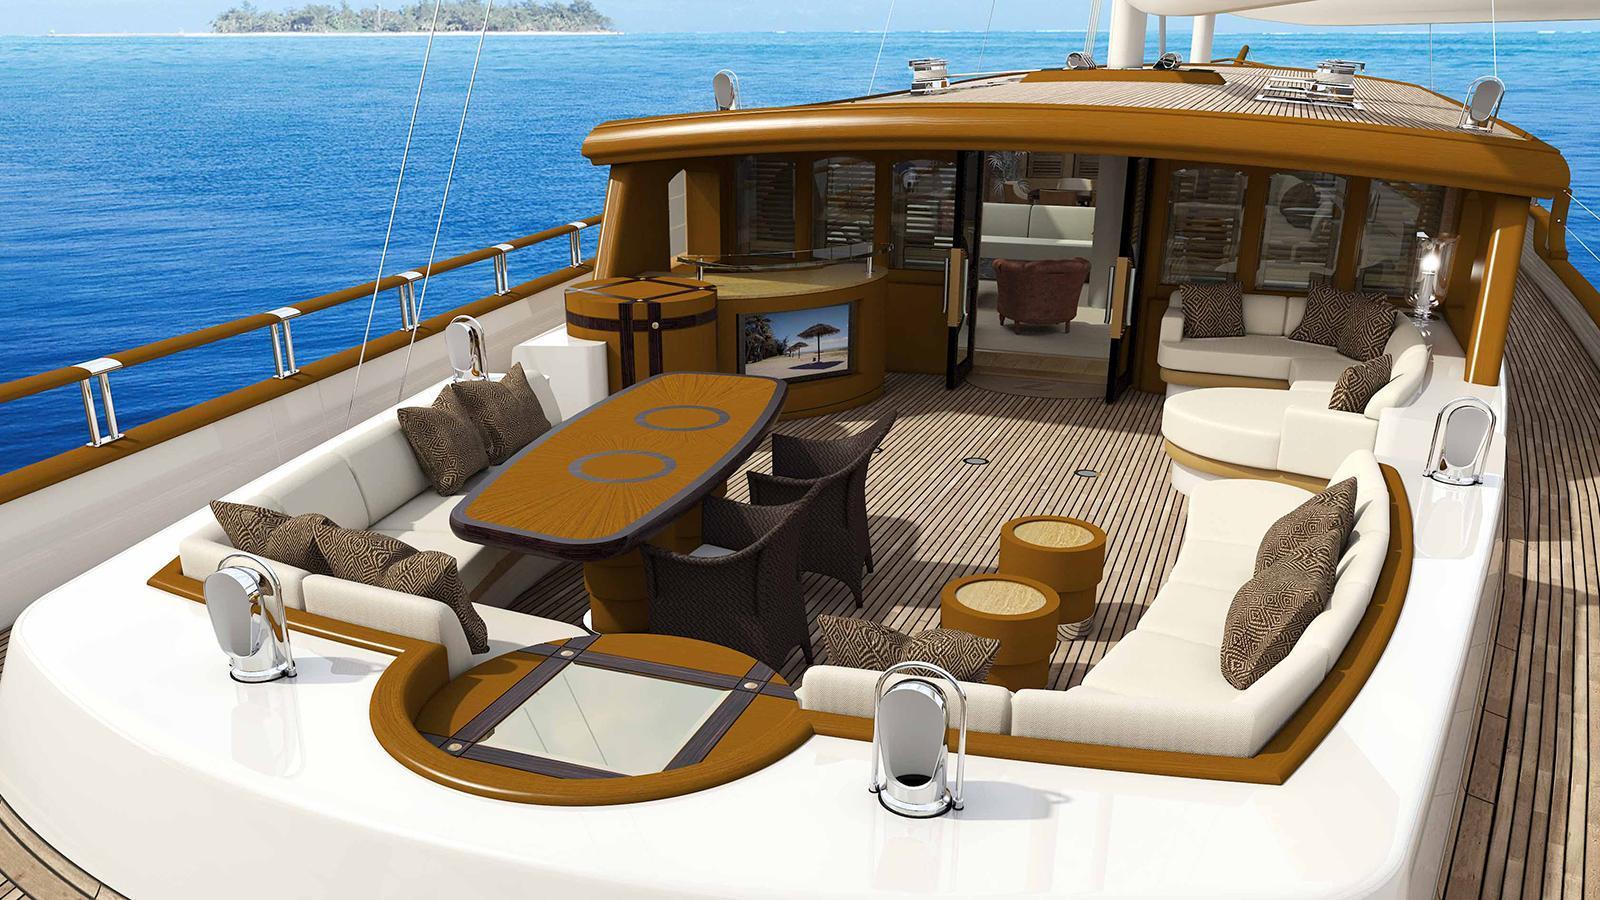 zanziba-sailing-yacht-archipelago-46m-2015-sun-deck